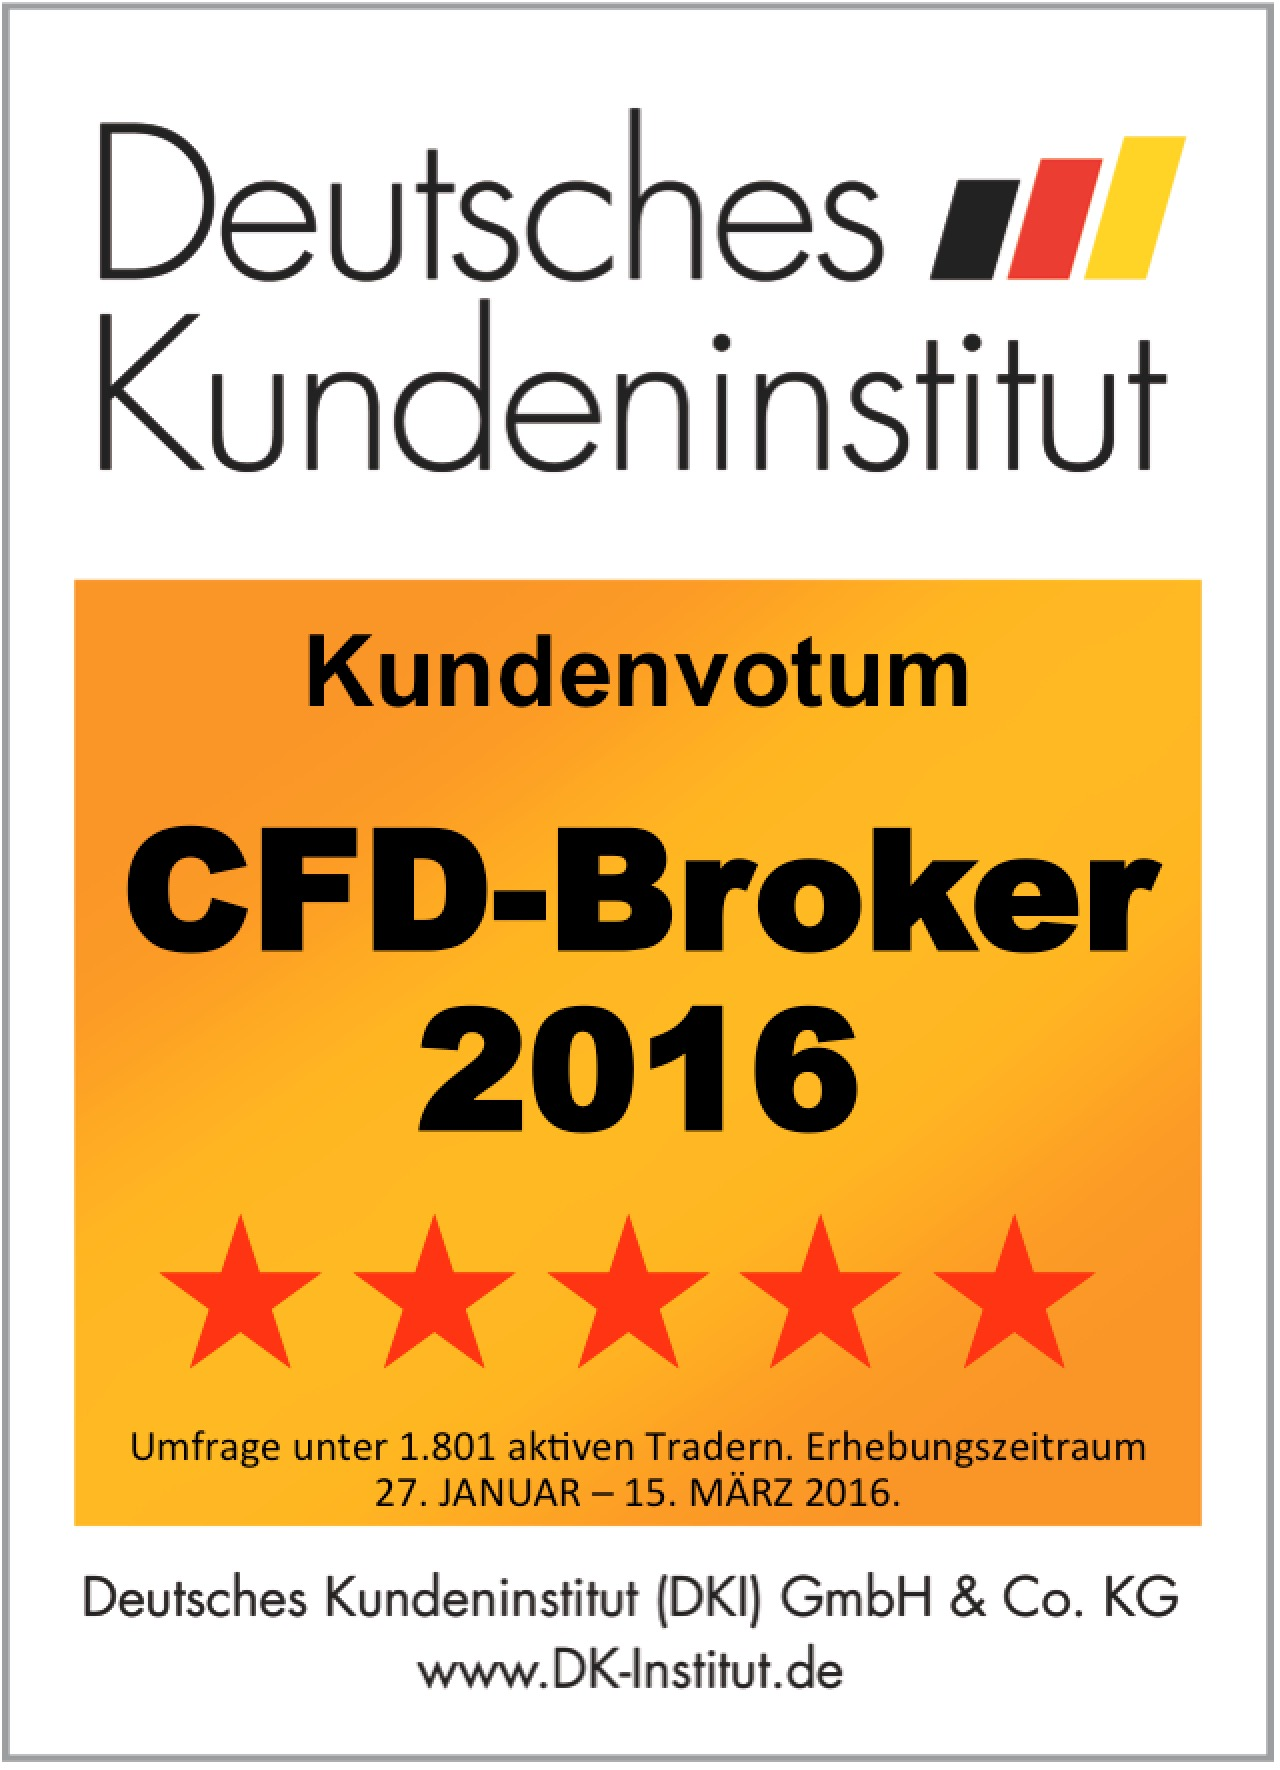 Comparatif des meilleurs brokers forex | Investir en ligne